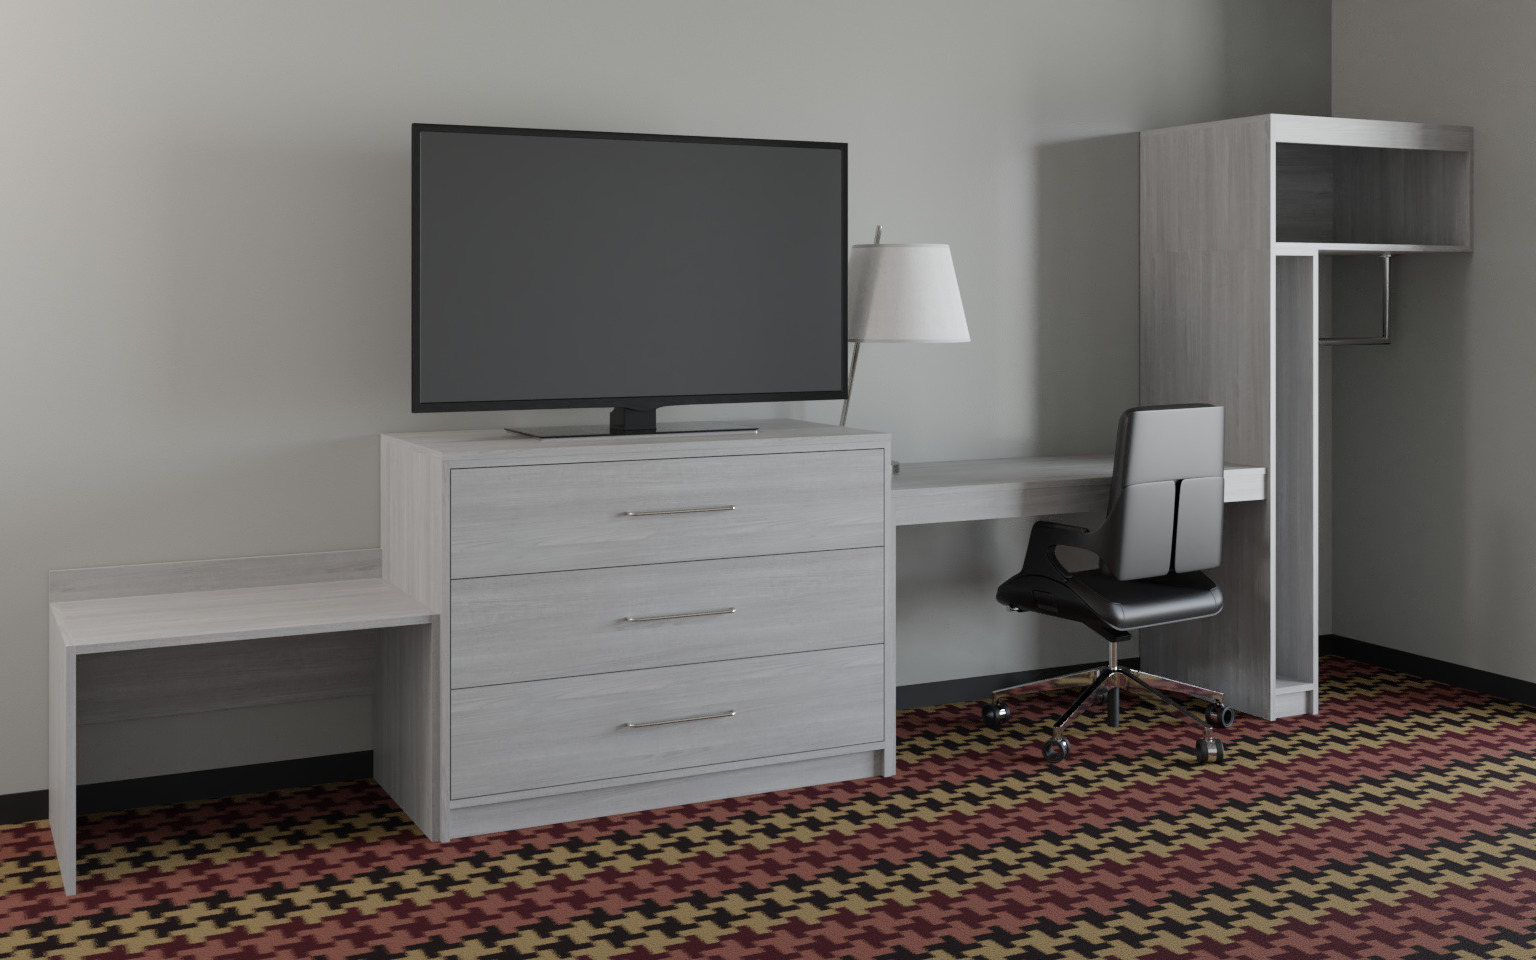 room-scene__wall-setup__2.0.jpg